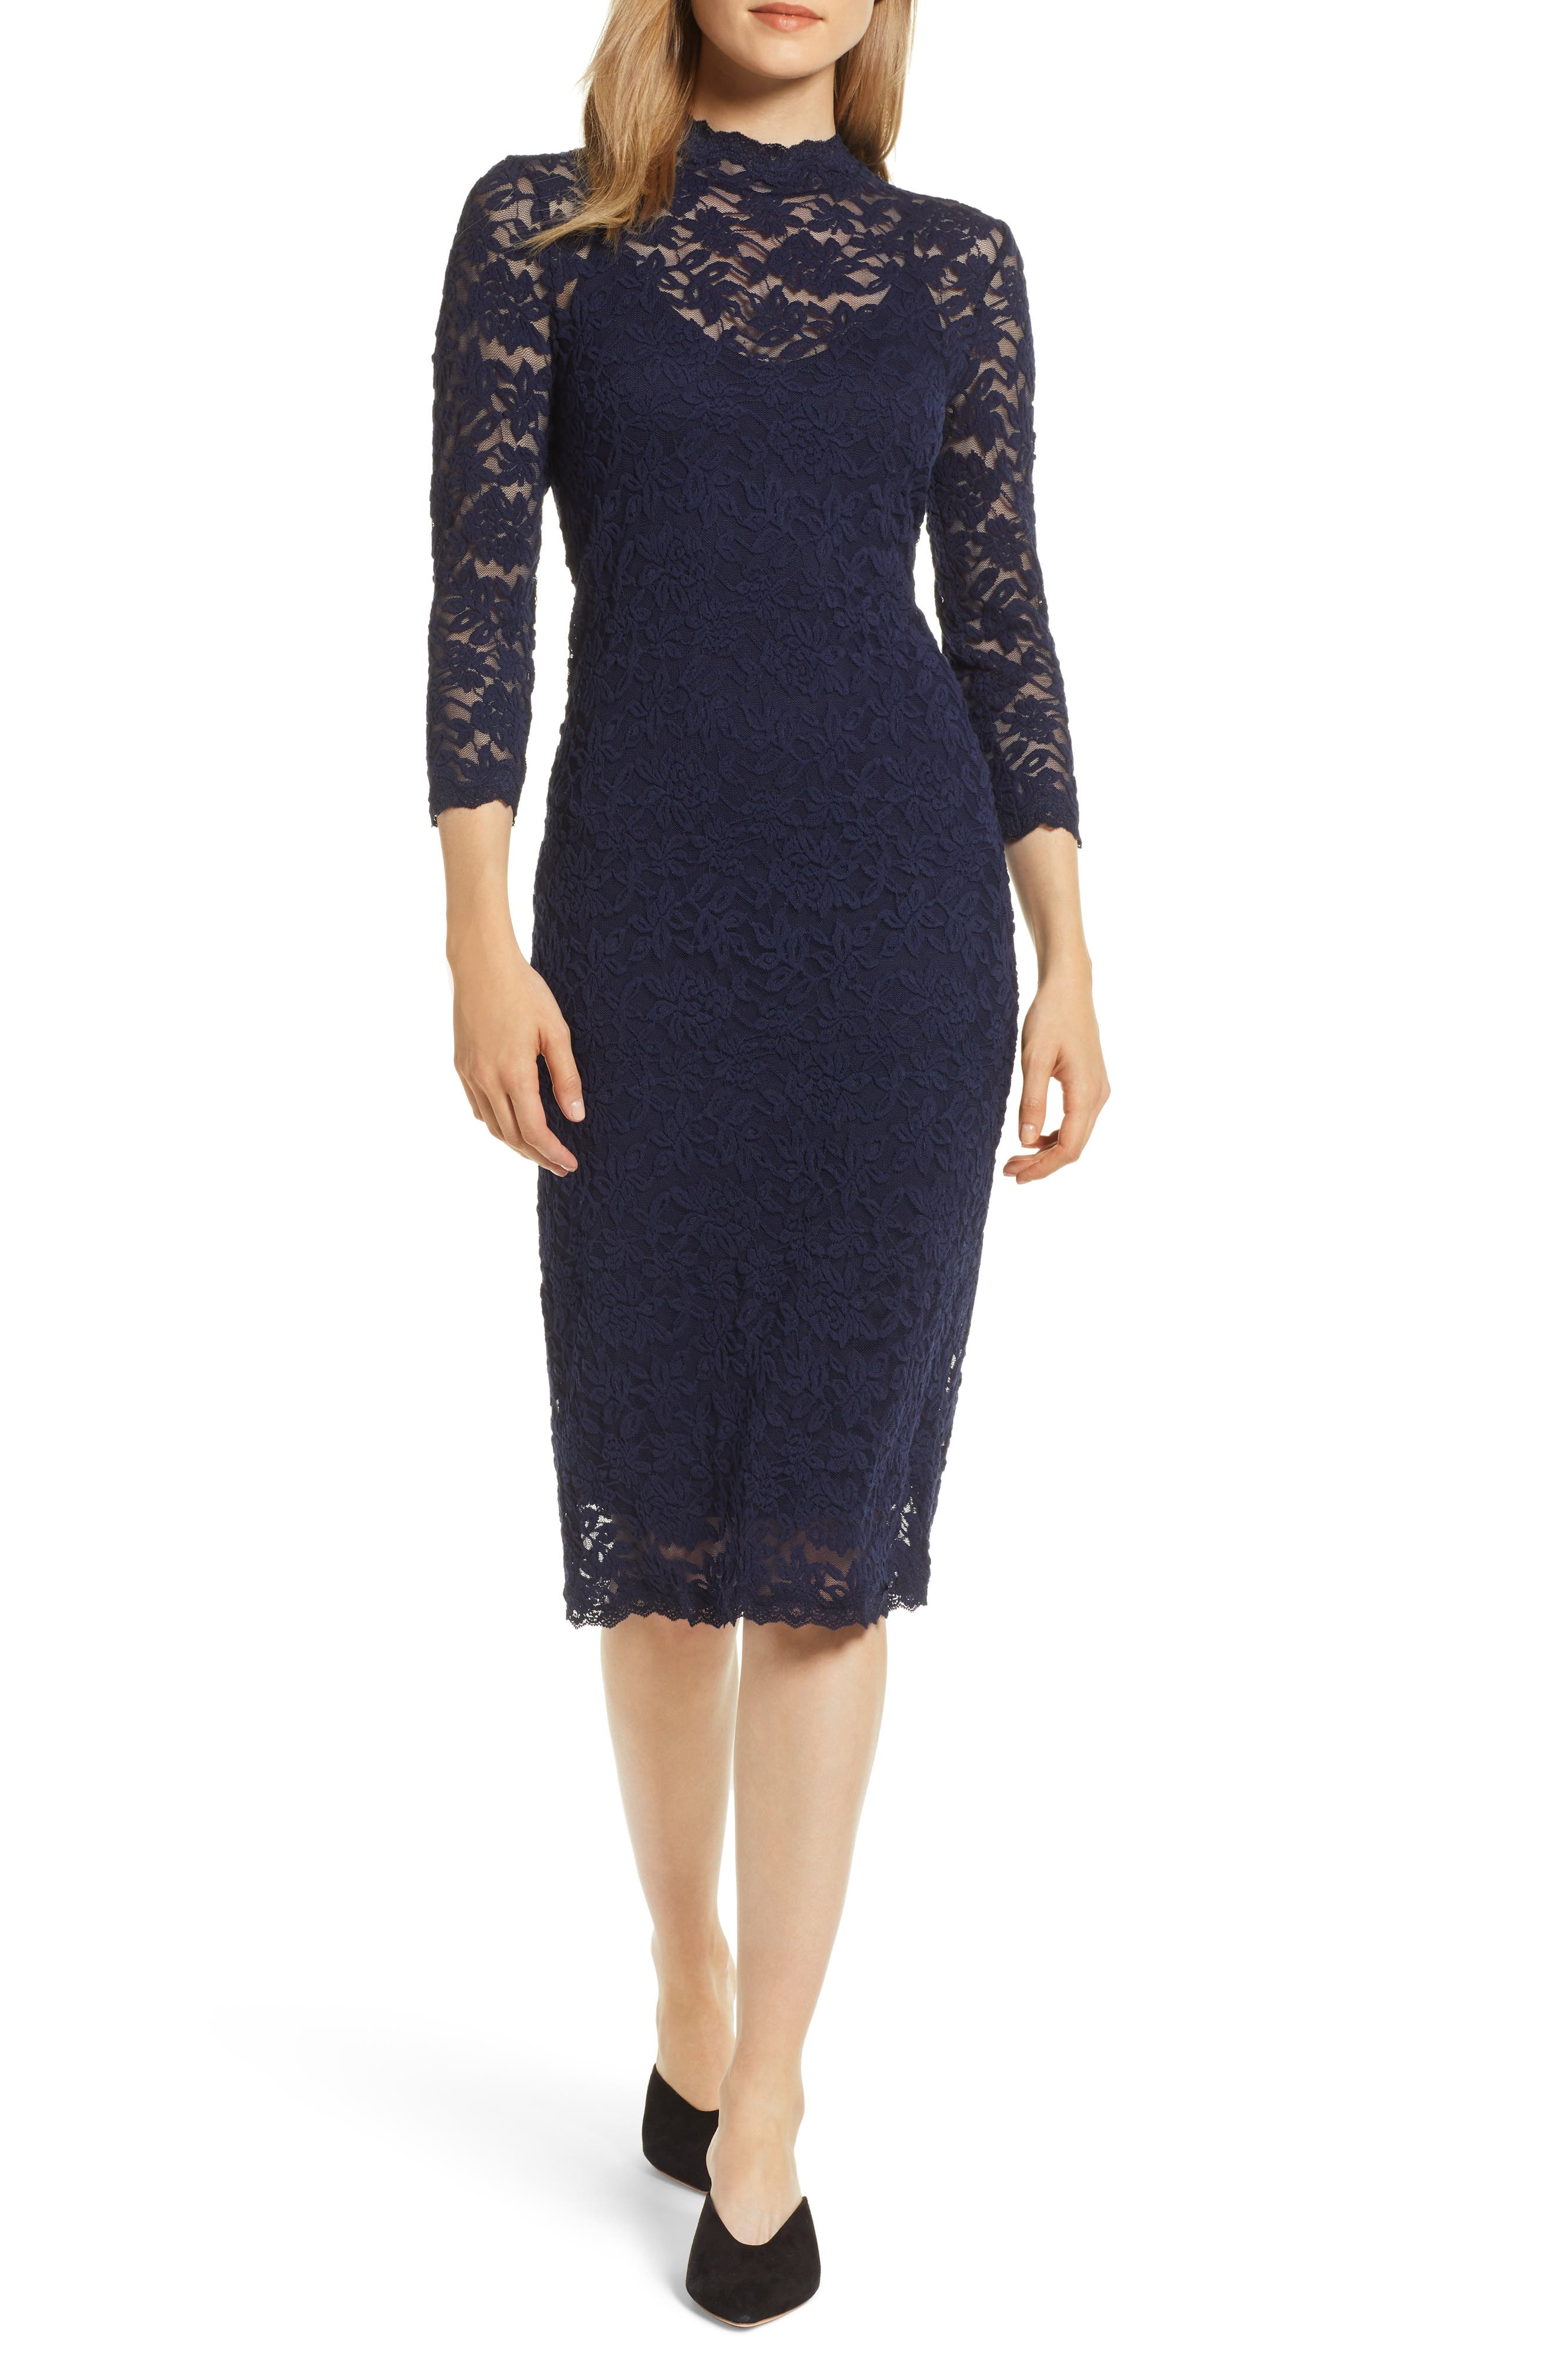 ROSEMUNDE, Delicia Lace Body-Con Dress, Main thumbnail 1, color, MARITIME BLUE